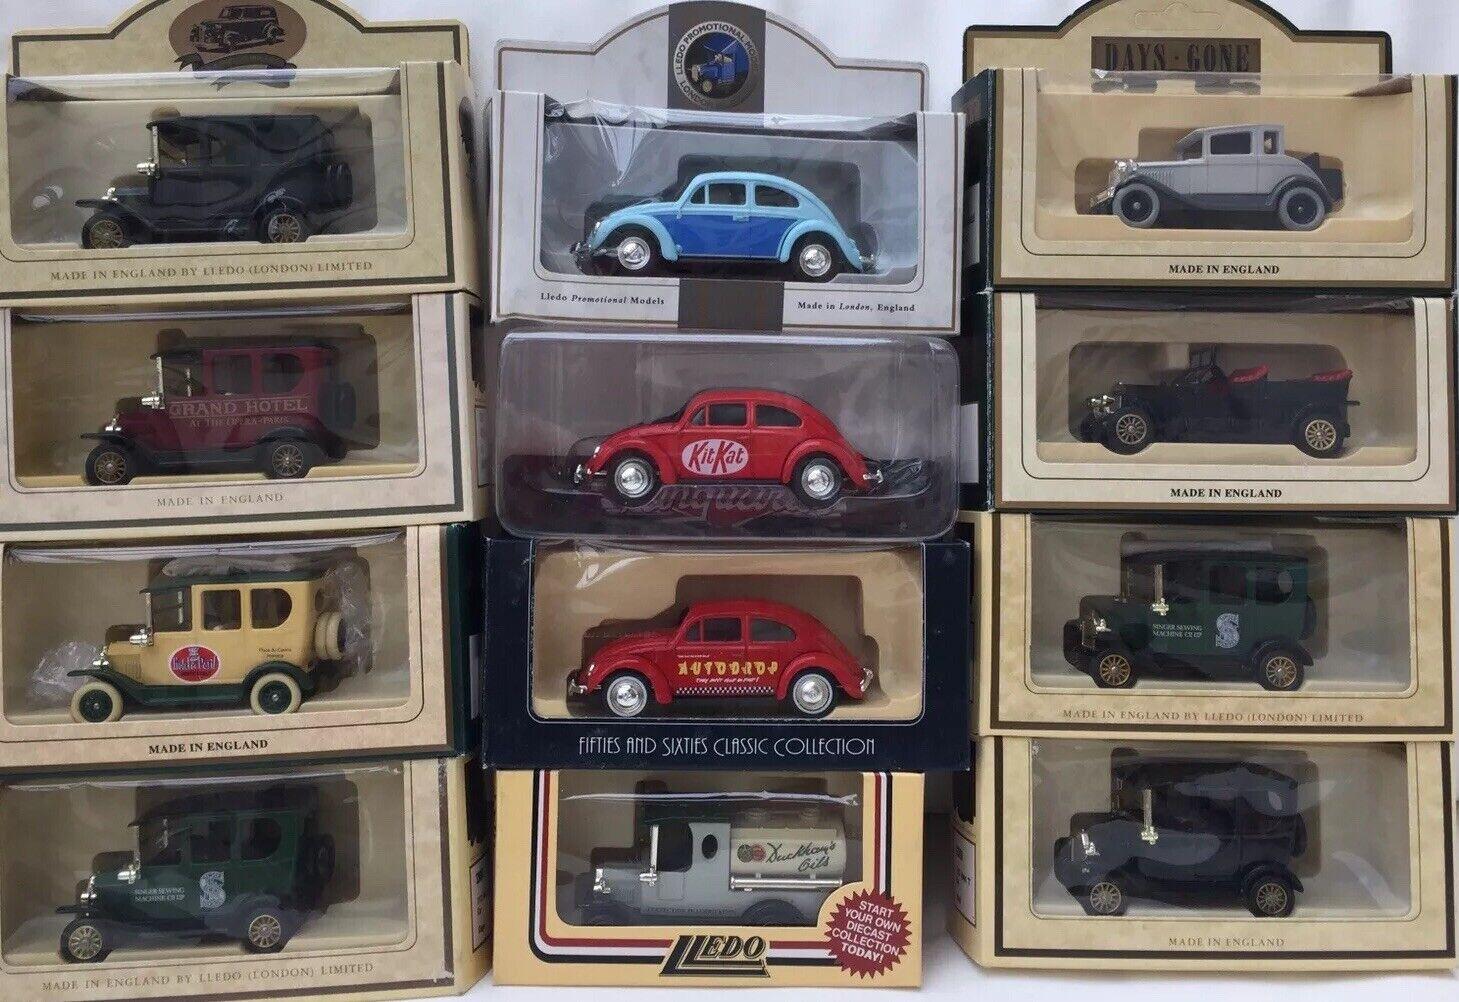 14 LLEDO Corgi DG LP Ford RR VW cars Kit Kat Cardrop Duckhams DAF Museum Singer